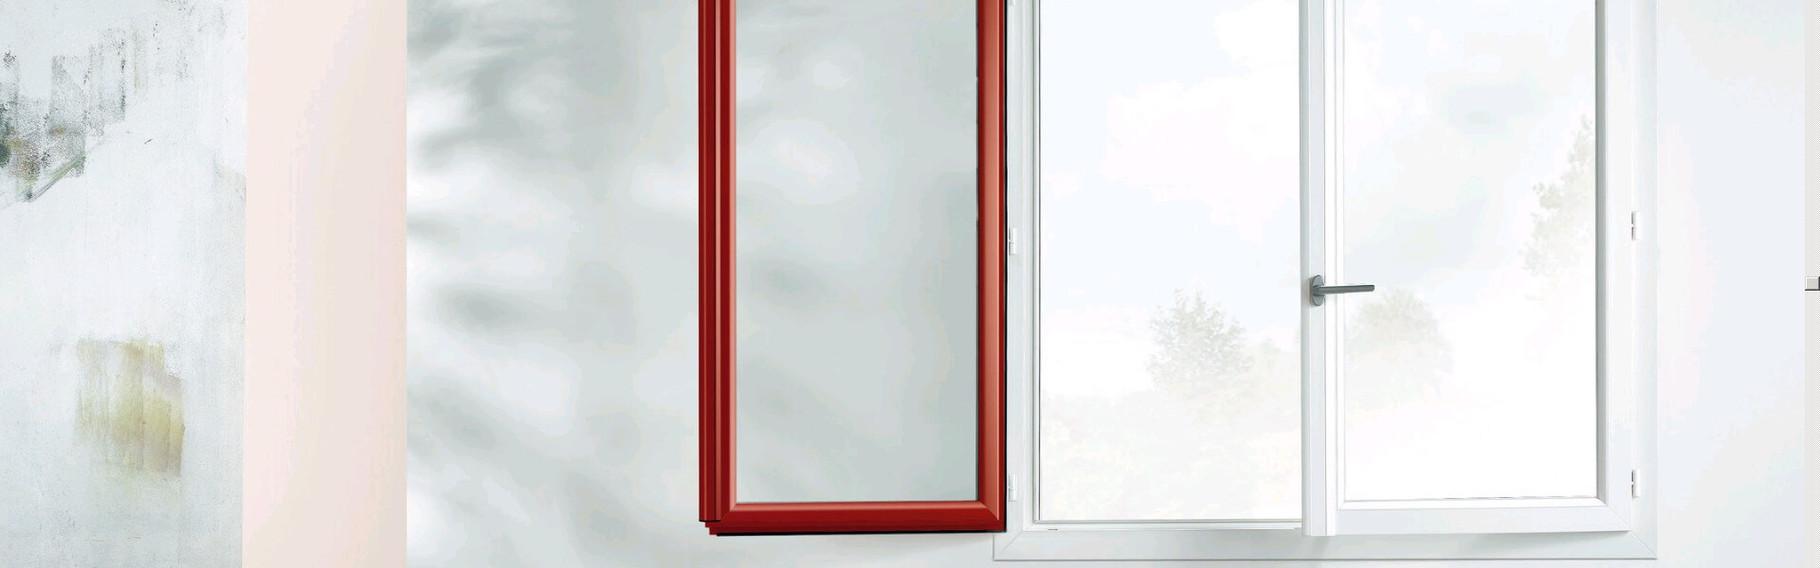 REHAU : Fenêtre battante bicolore